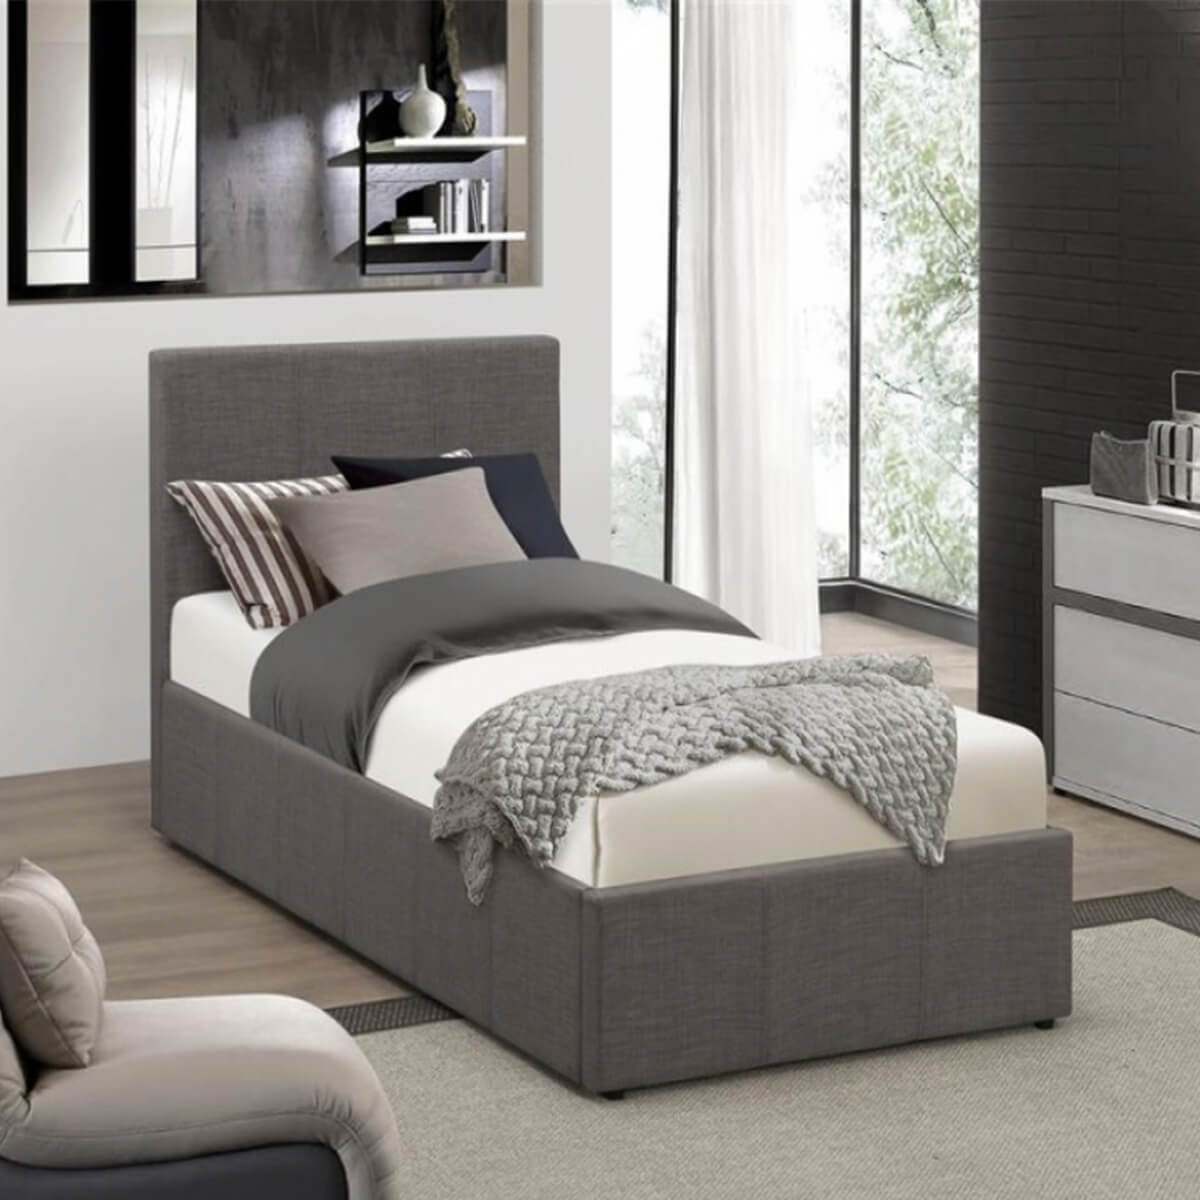 Lyon Ottoman Single Bed Frame Fabric Grey 3